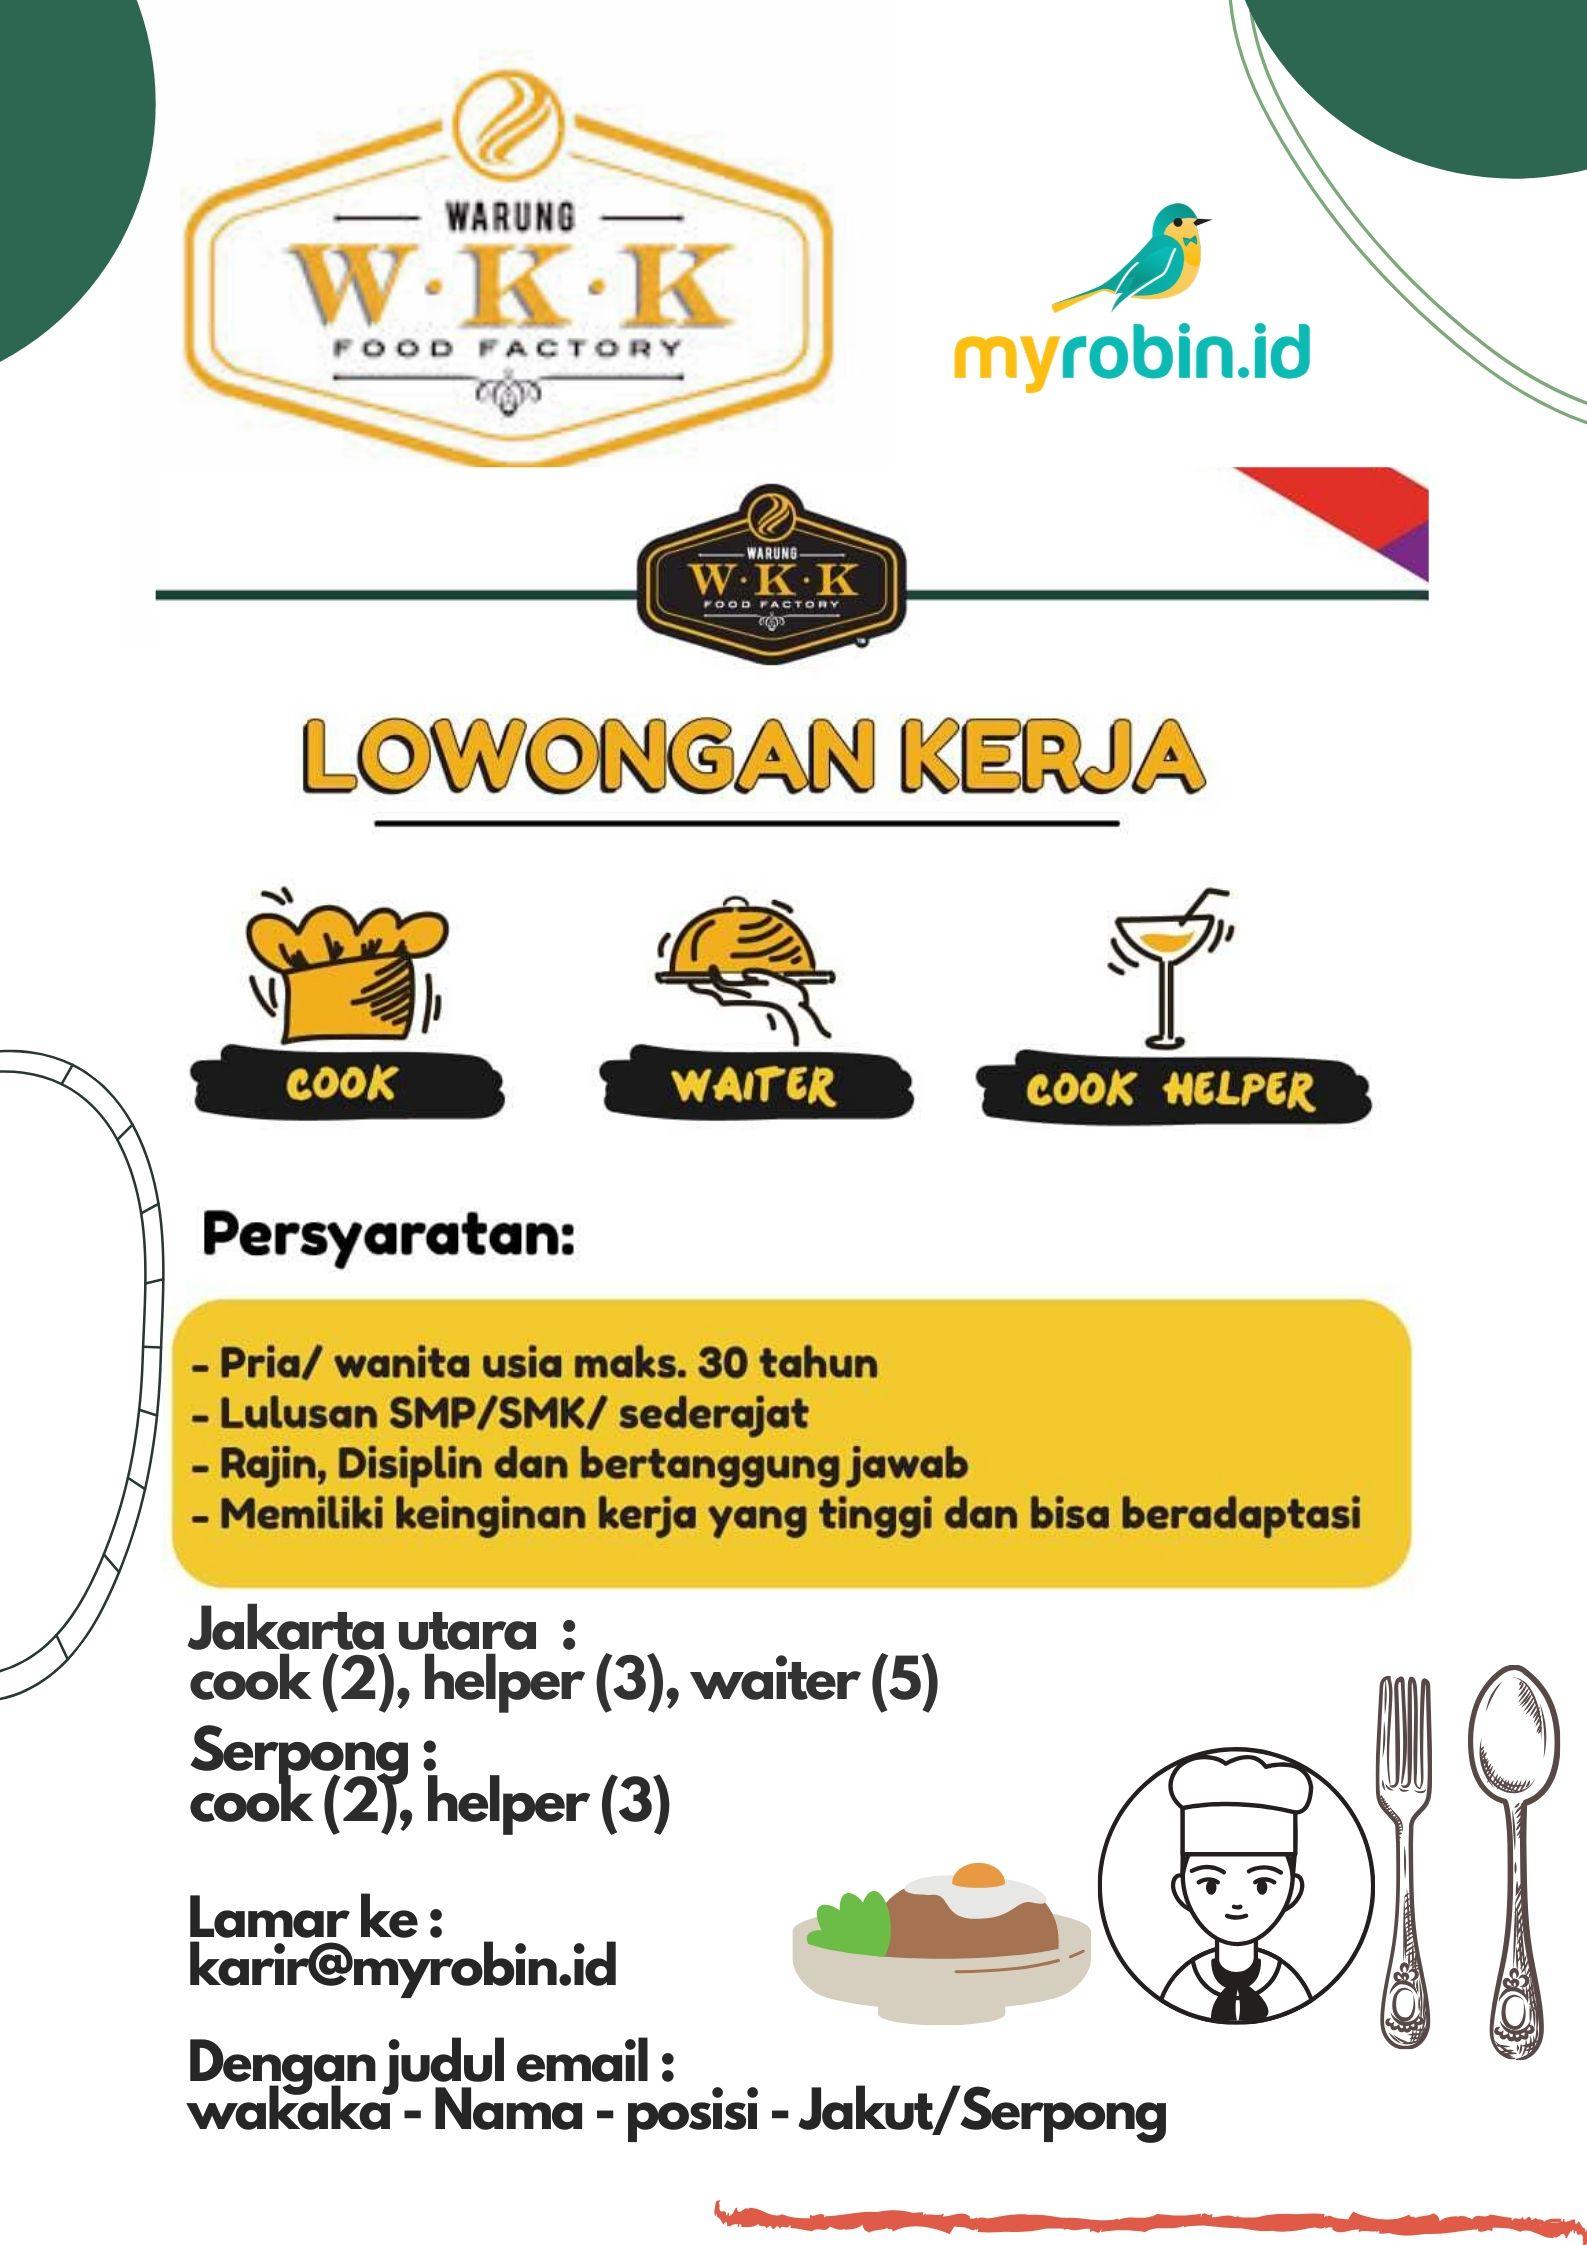 Wakaka Cafe buka lowongan untuk outlet baru Serpong & Jakarta Utara - MyRobin